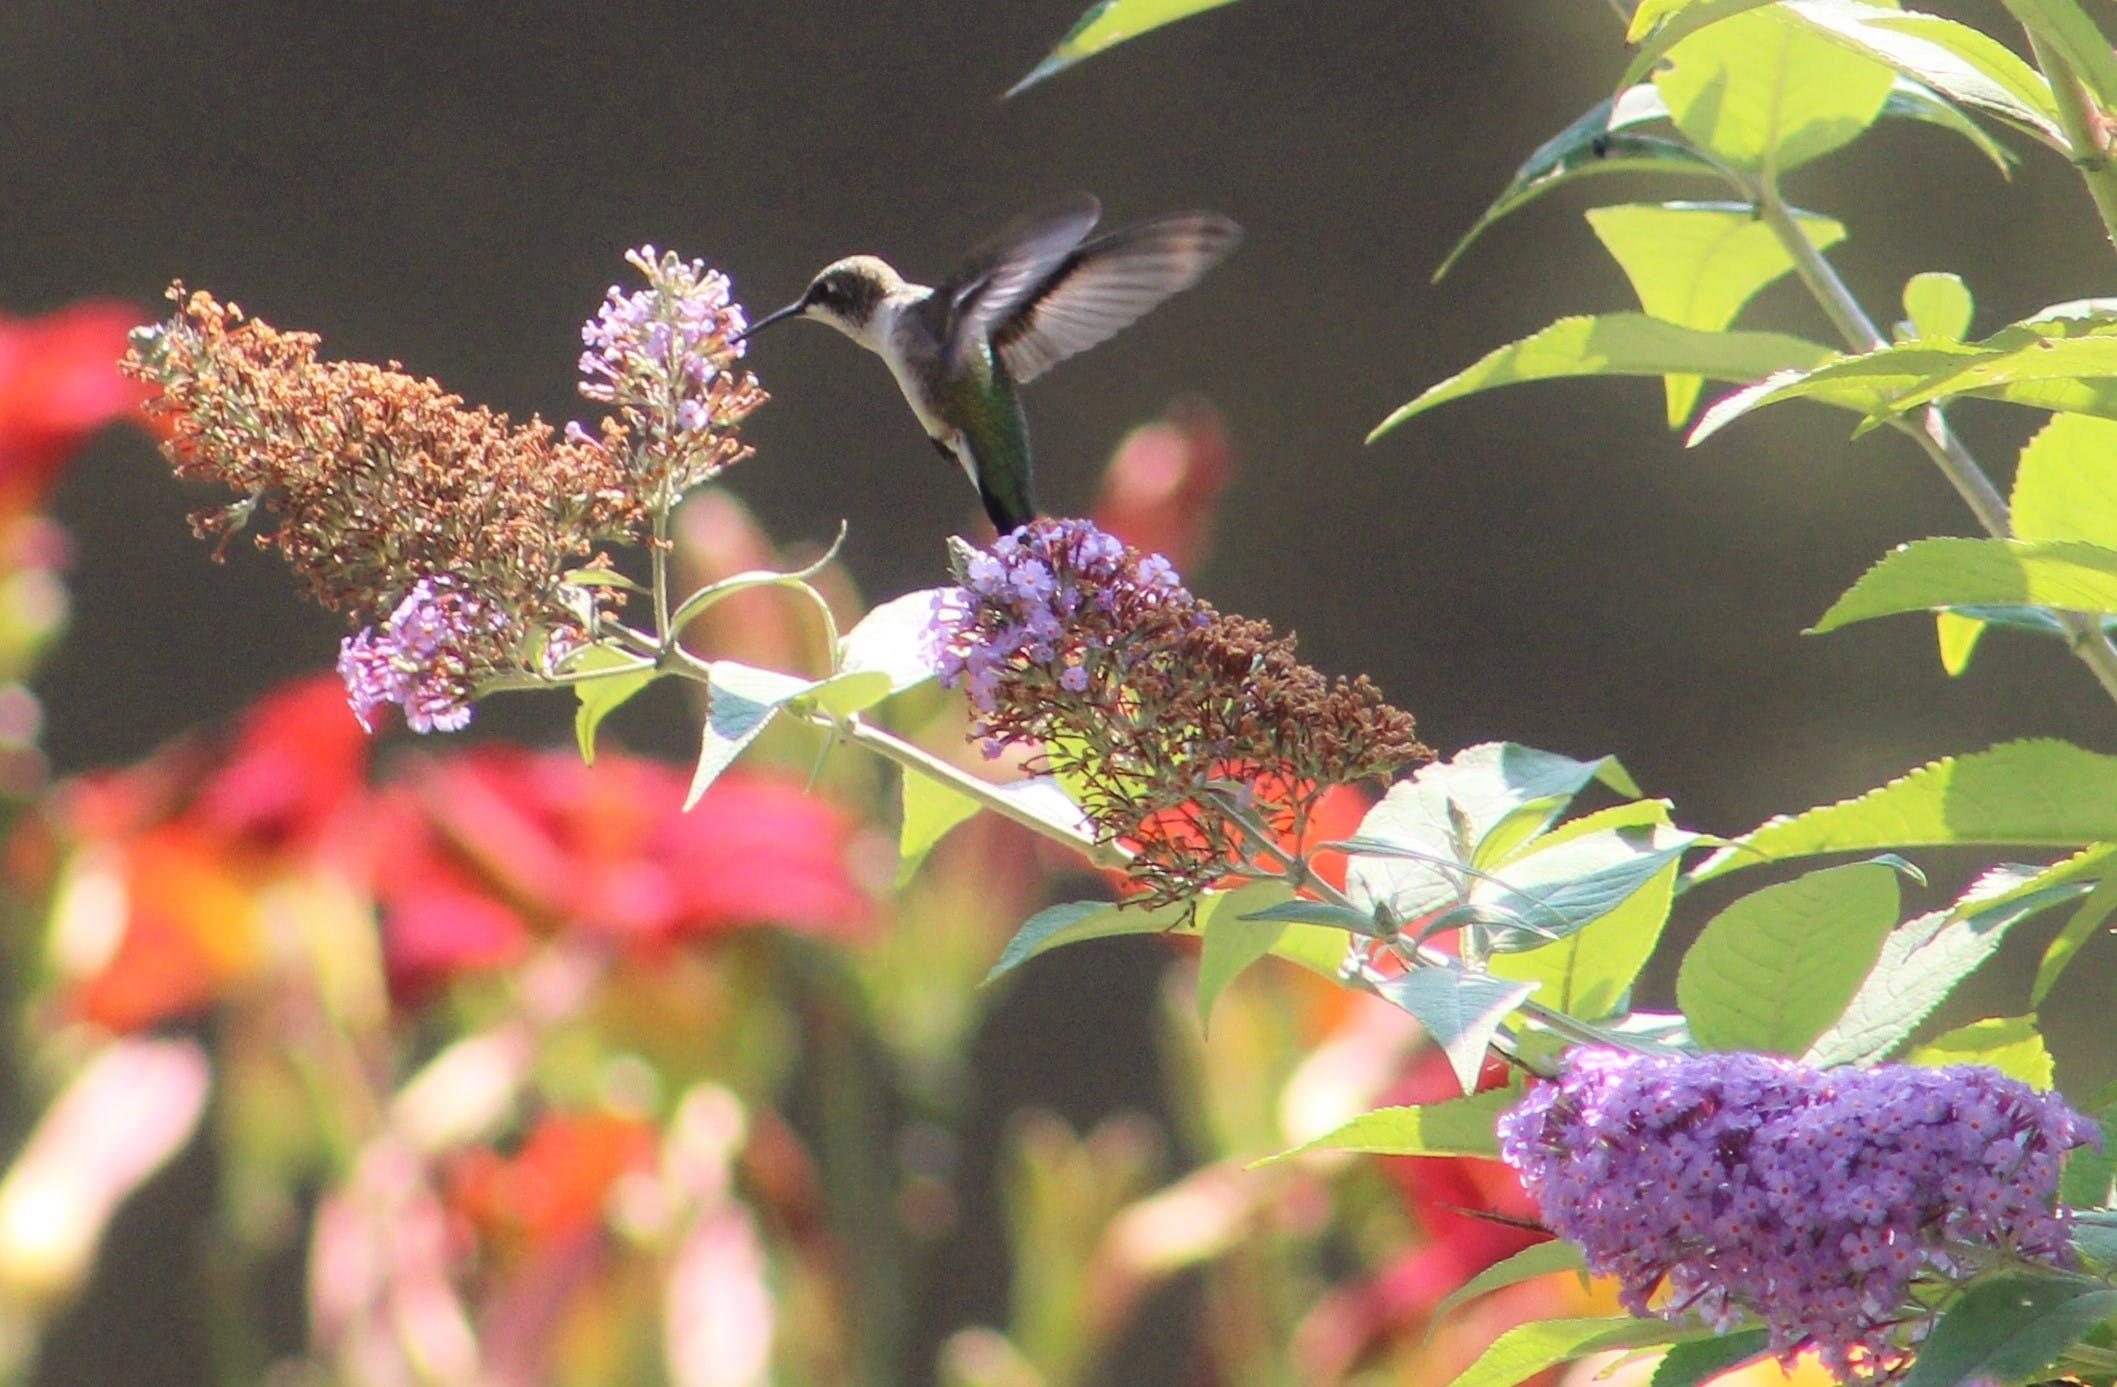 Free stock photo of flying hummingbird, male hummingbird, nectar, purple flowers